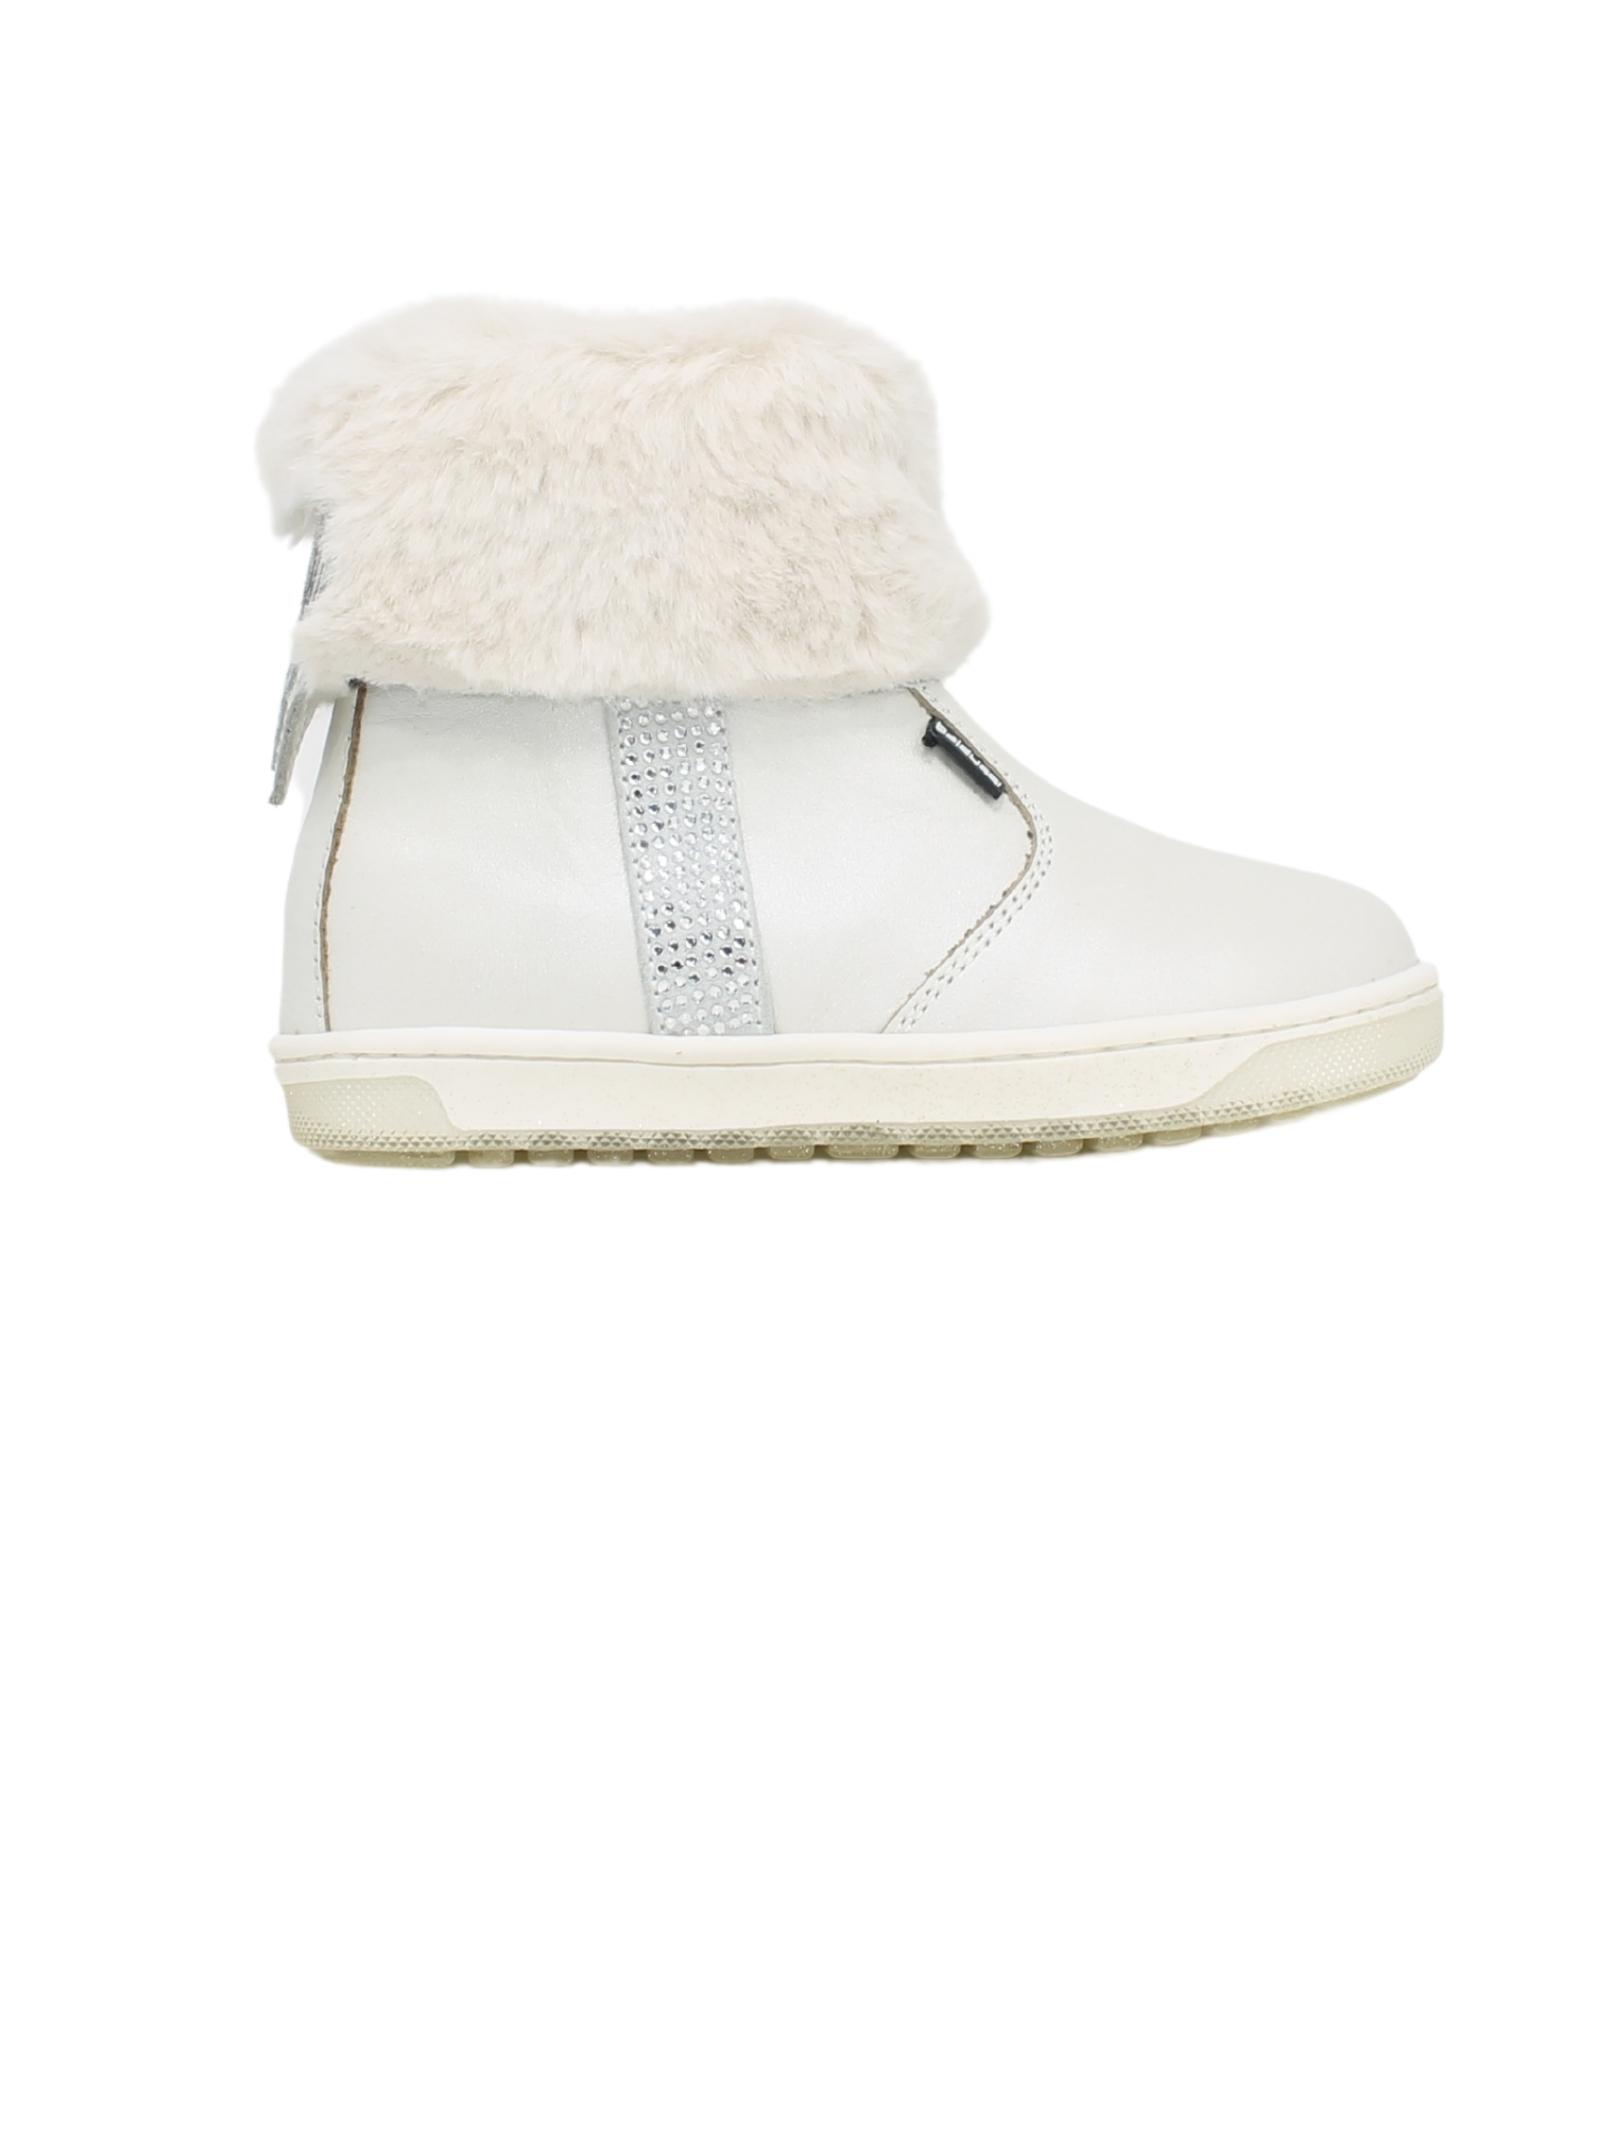 Boots with Heart Girl BALDUCCI |  | MSPO3838BIANCO